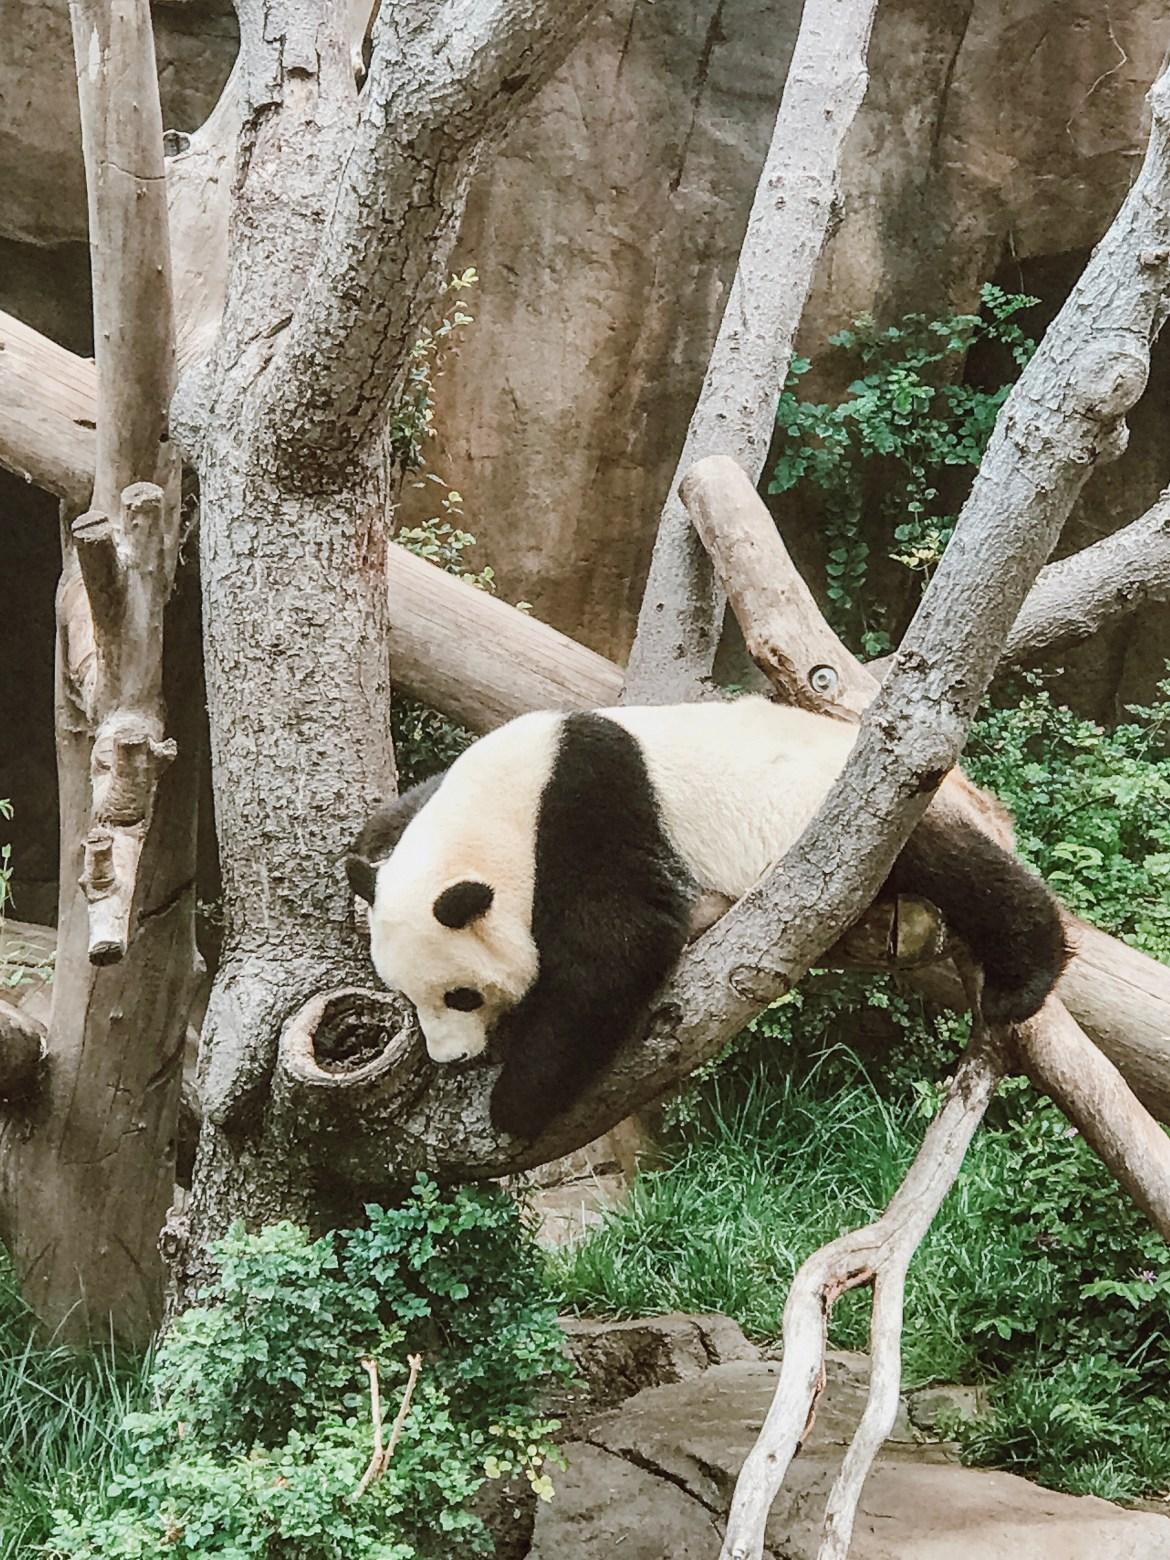 Panda at the San Diego Zoo, California